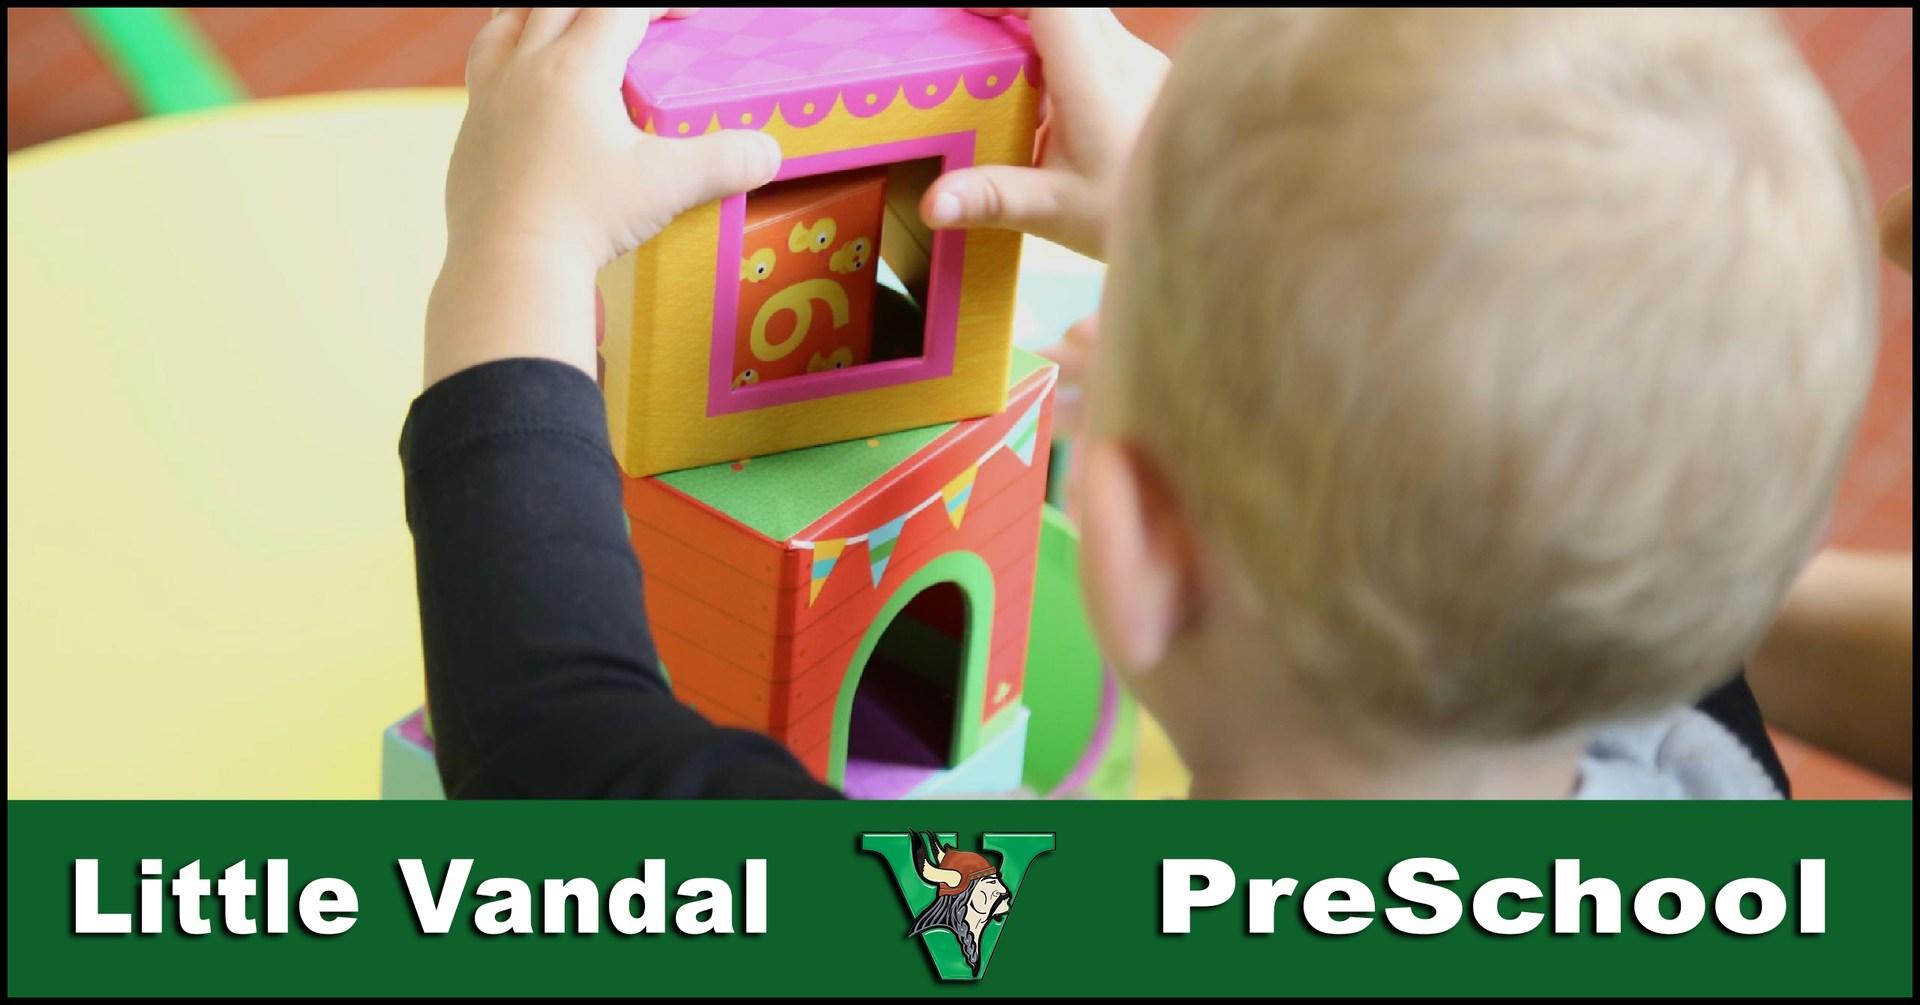 Little Vandal PreSchool